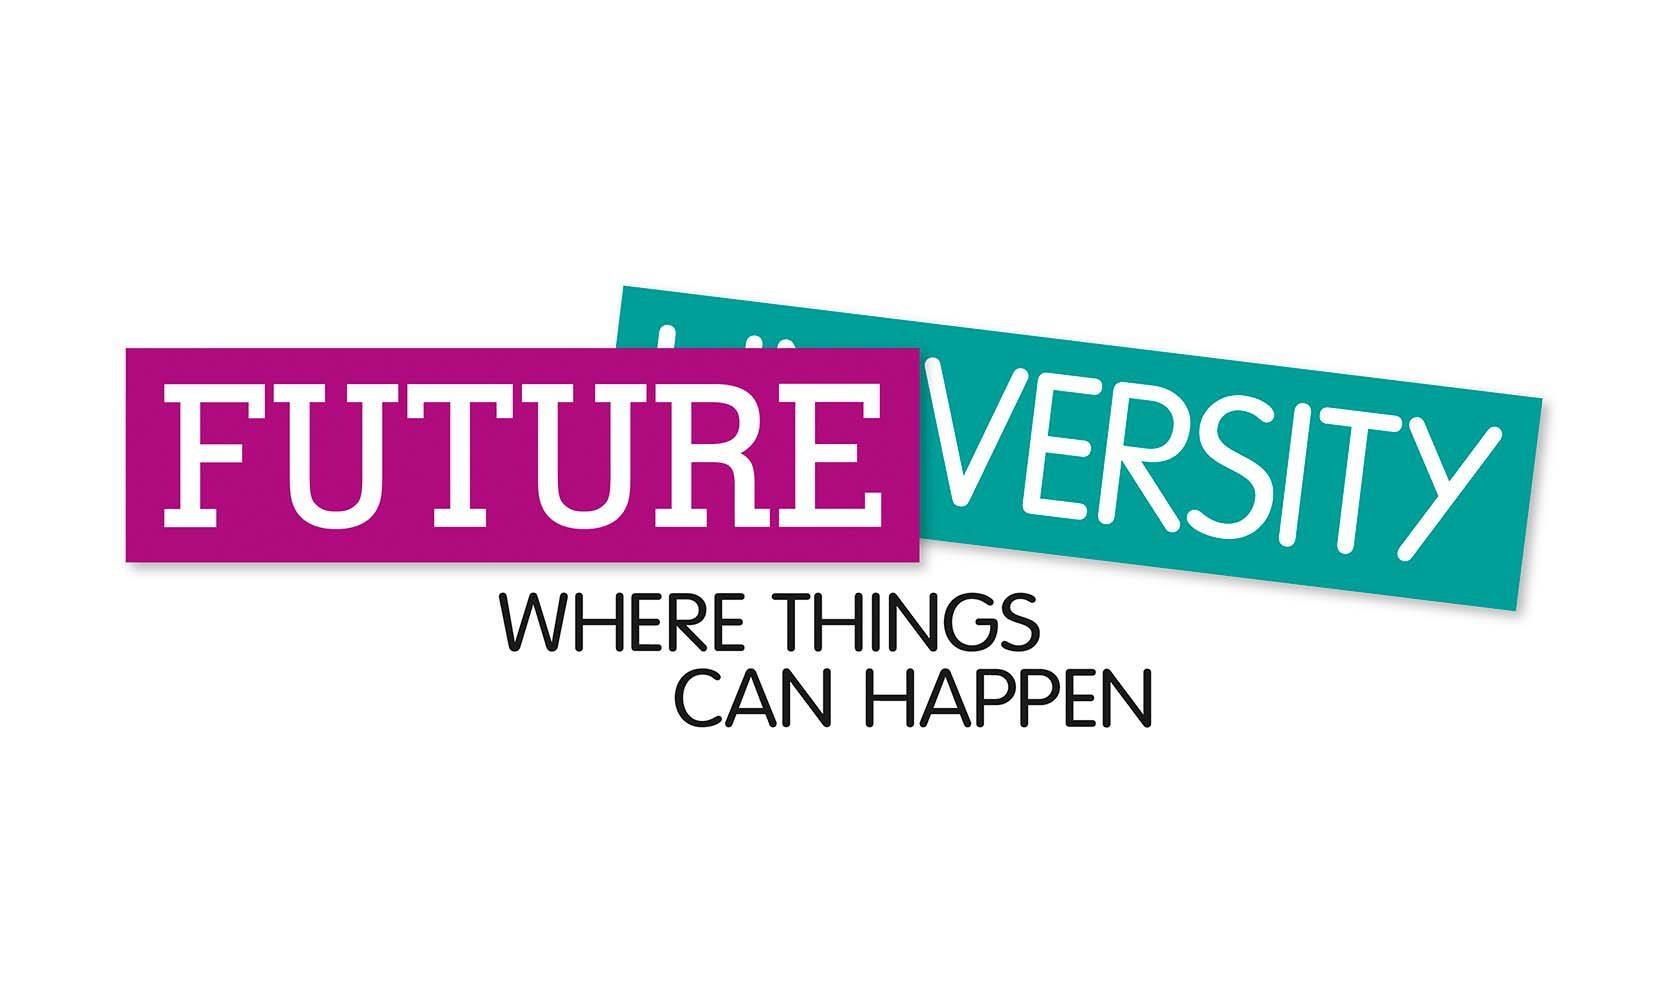 WMH-FUTUREVERSITY-MAIN-LOGO-WEB image